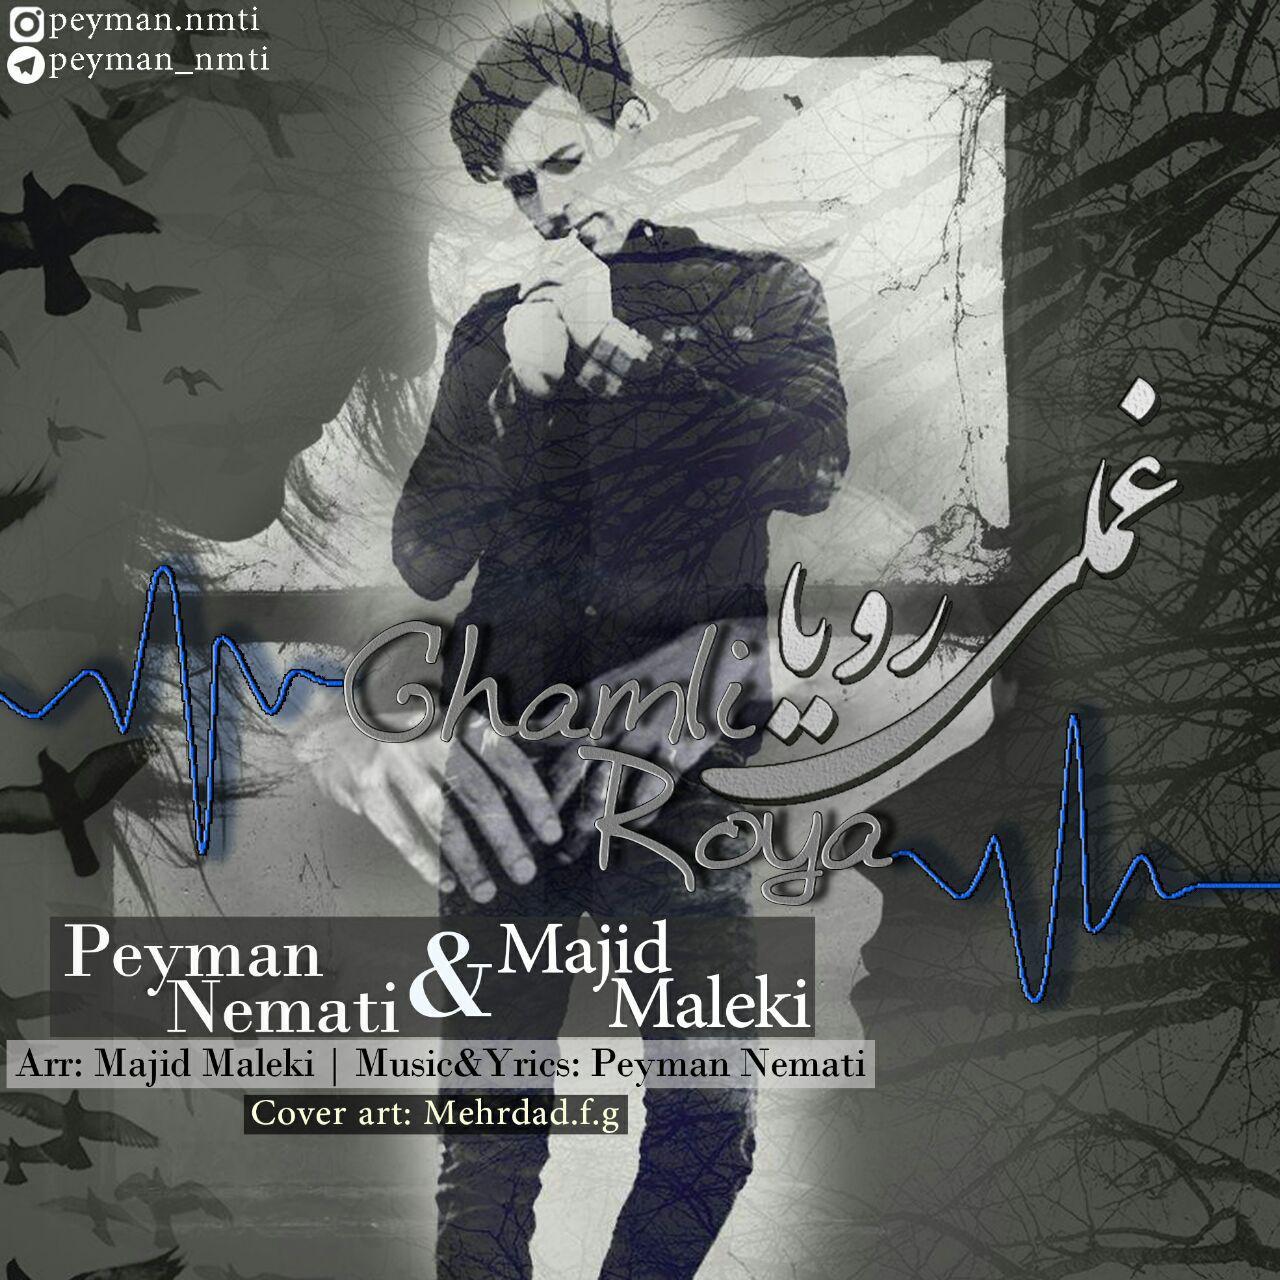 http://s8.picofile.com/file/8329876042/47Peyman_Nemati_Majid_Maleki_Ghamli_Roya.jpg